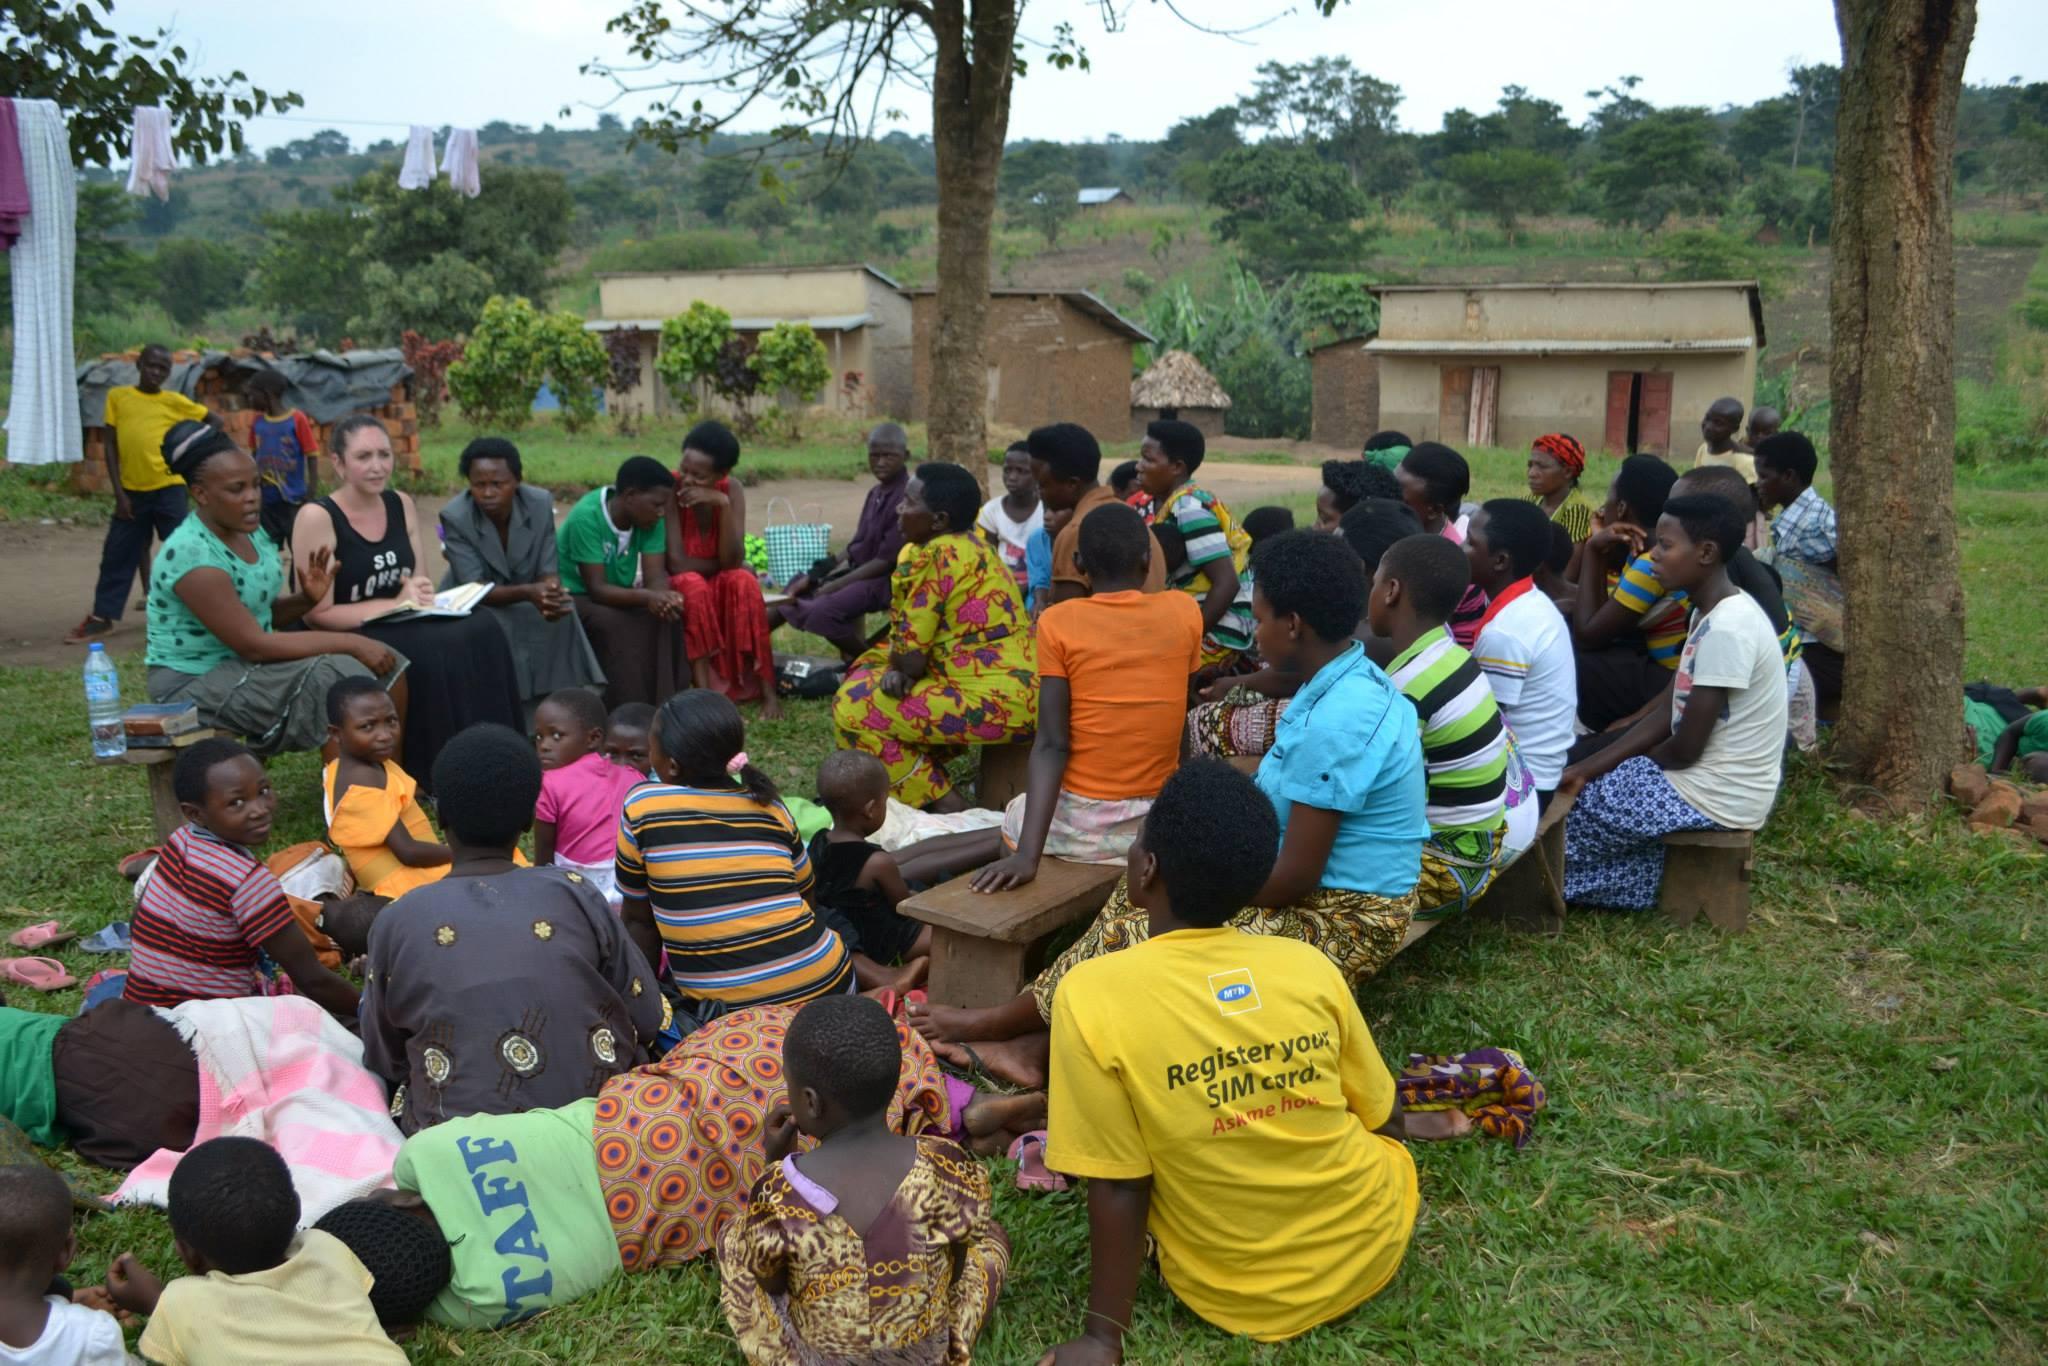 Nyairongo Christian Outreach